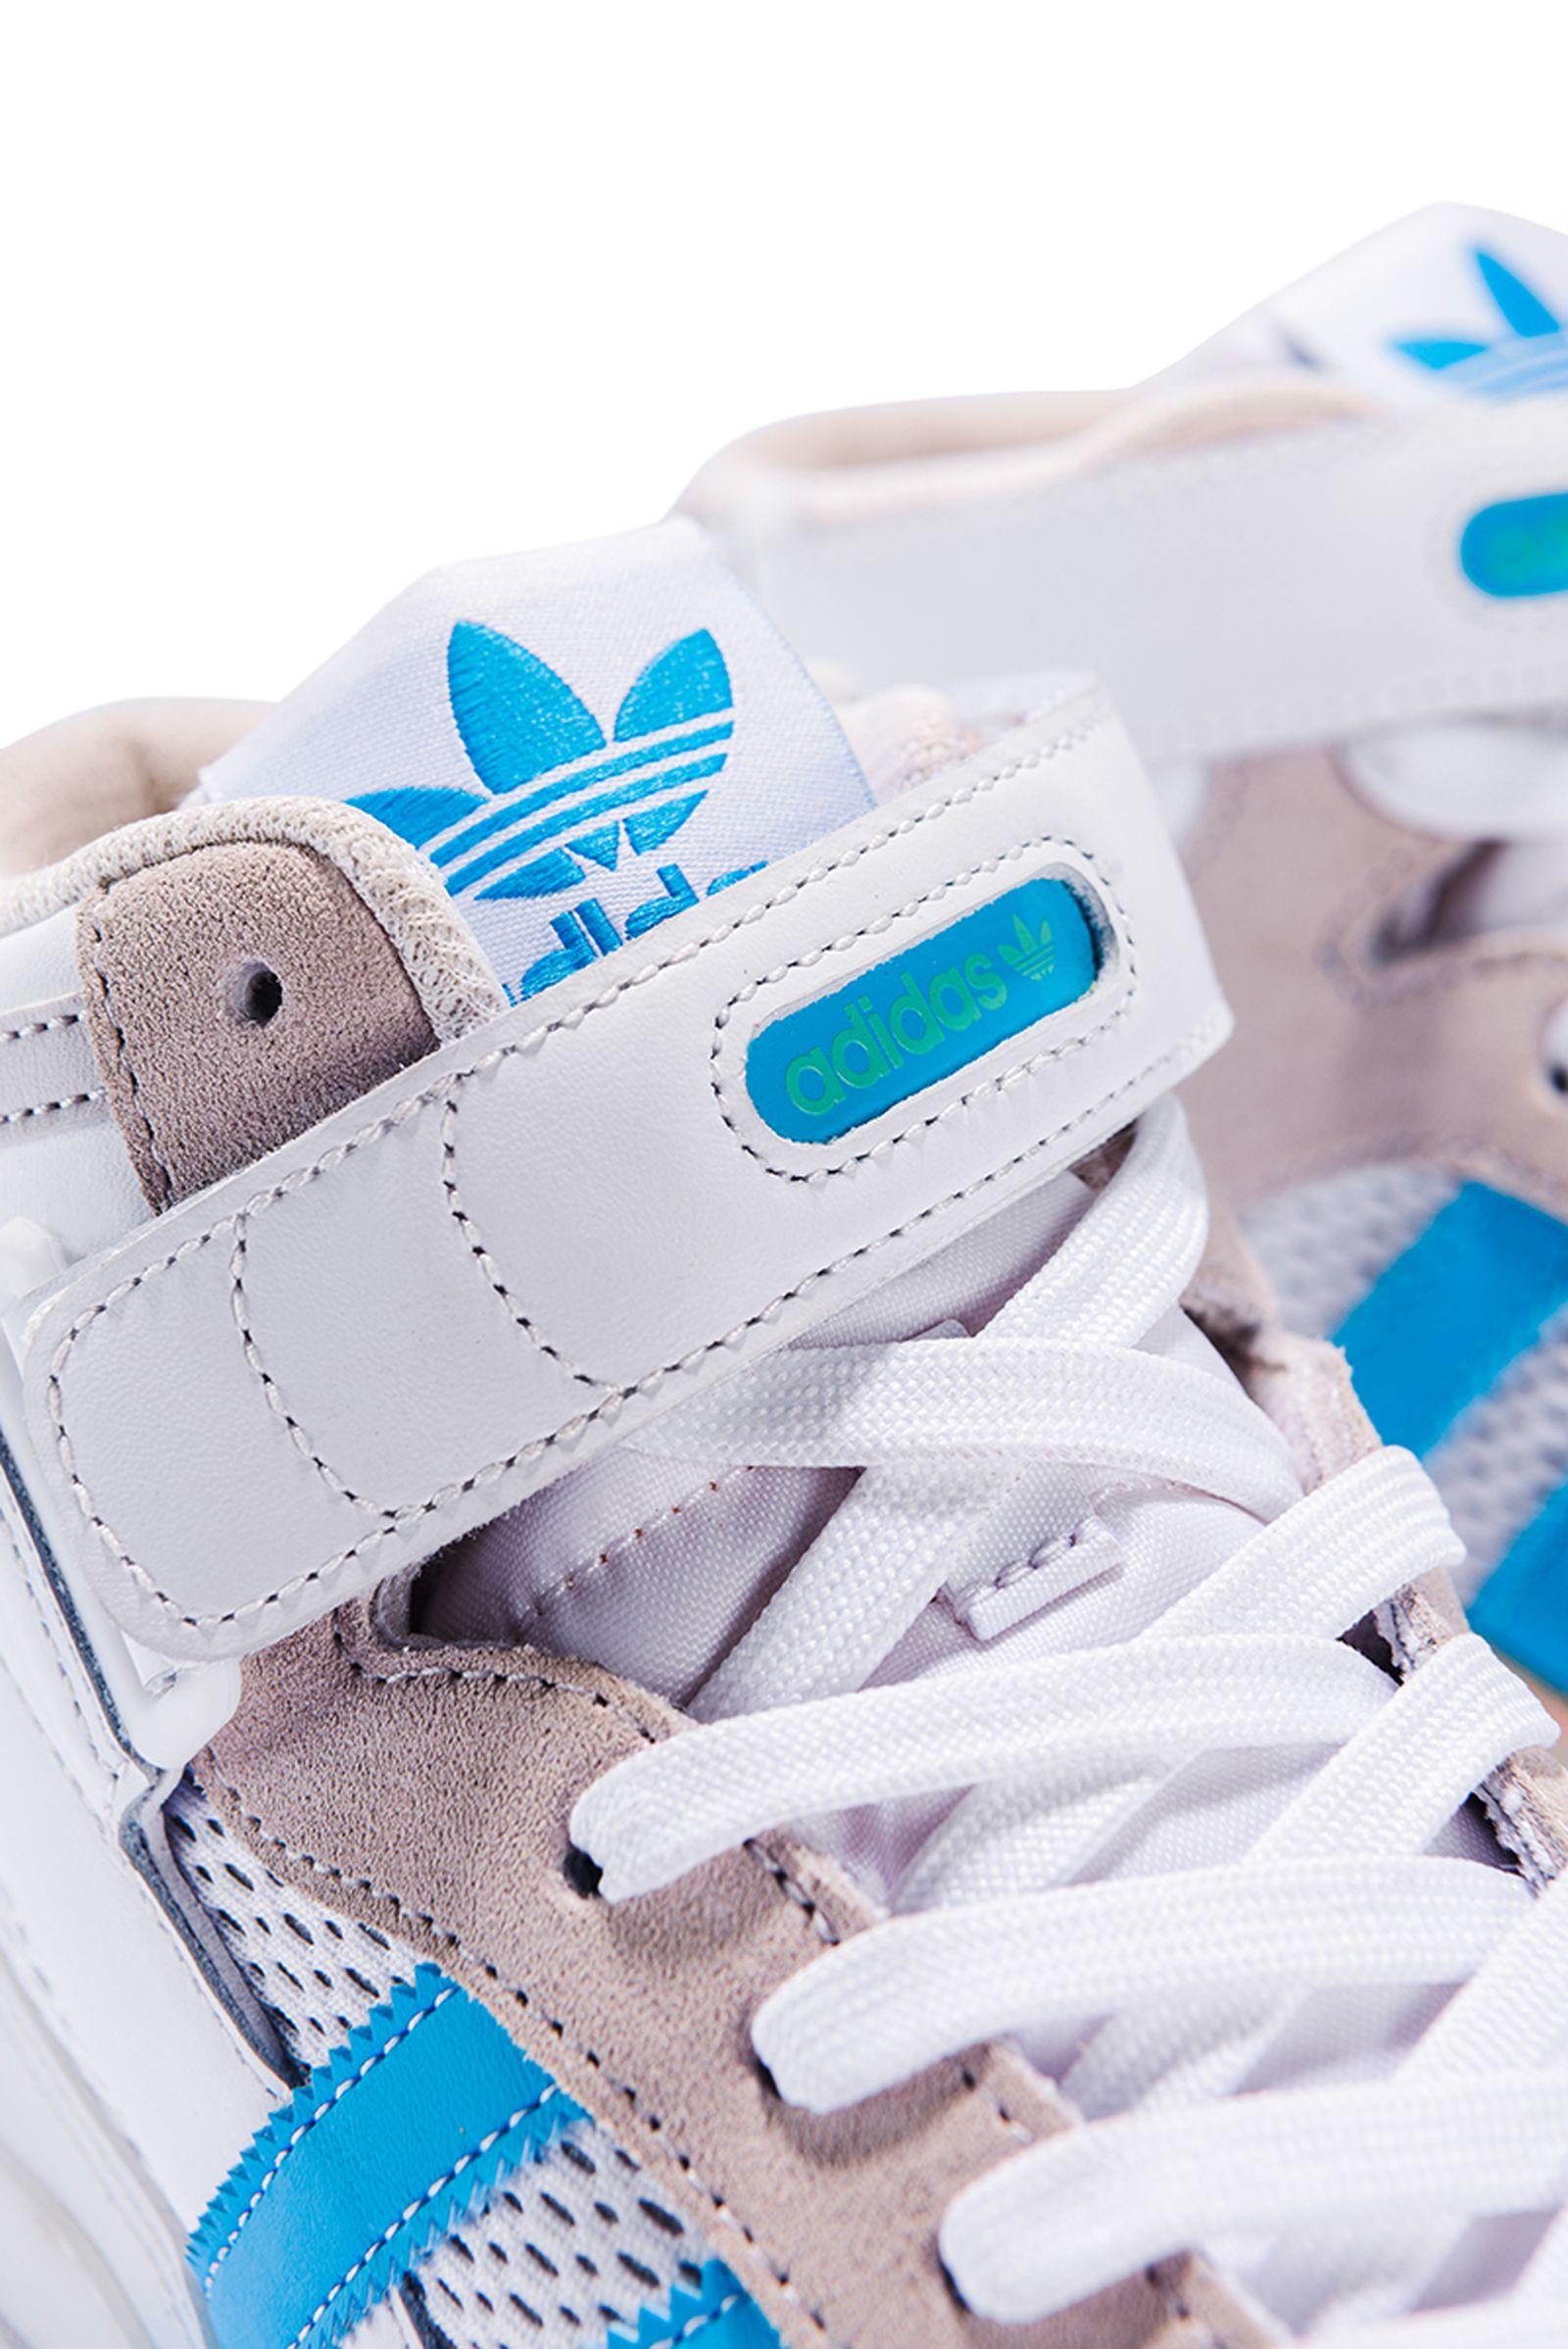 adidas-skateboarding-forum-84-adv-diego-najera-release-date-price-1-006